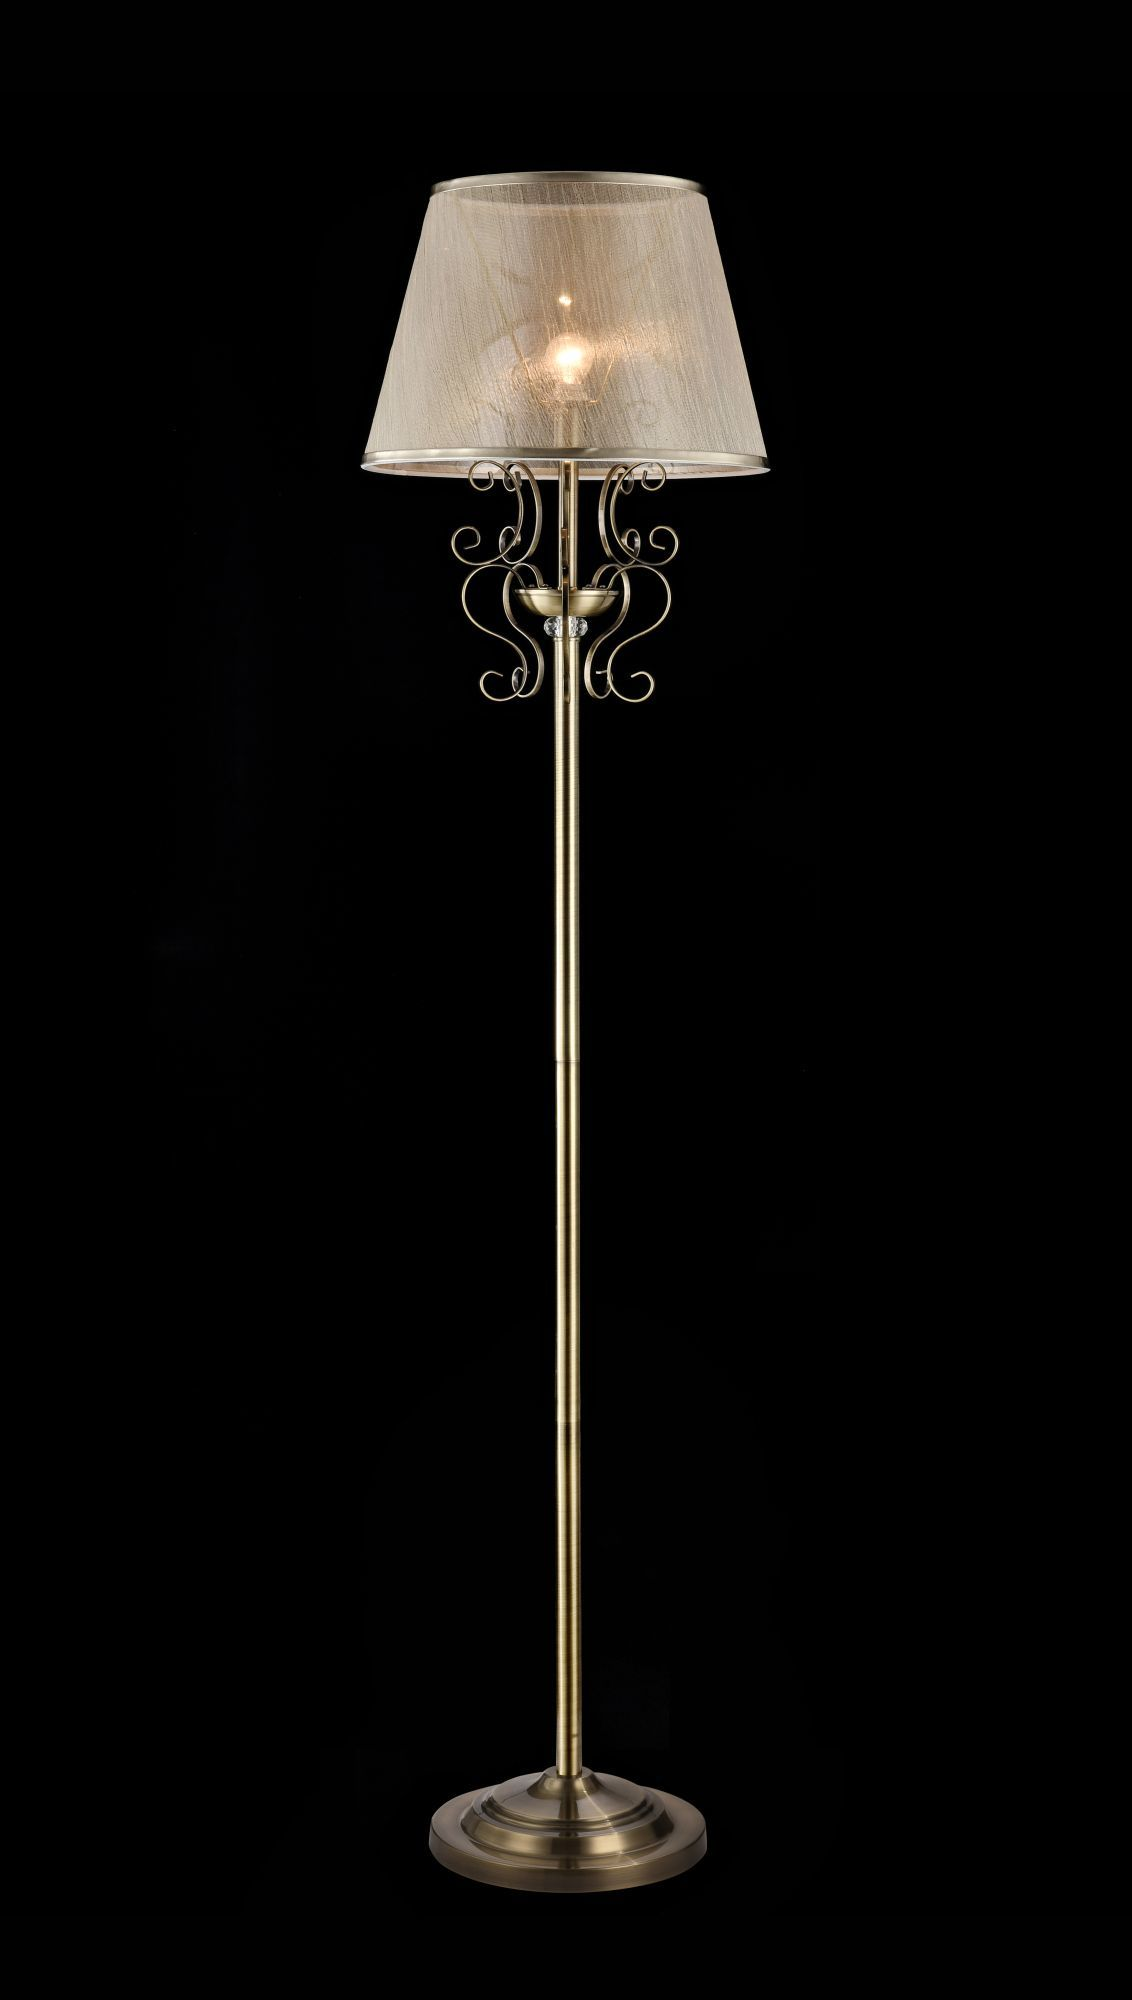 Торшер Freya Classic Driana FR2405-FL-01-BZ (FR405-001-R), 1xE14x40W, бронза с прозрачным, прозрачный с бронзой, металл с хрусталем, текстиль - фото 3